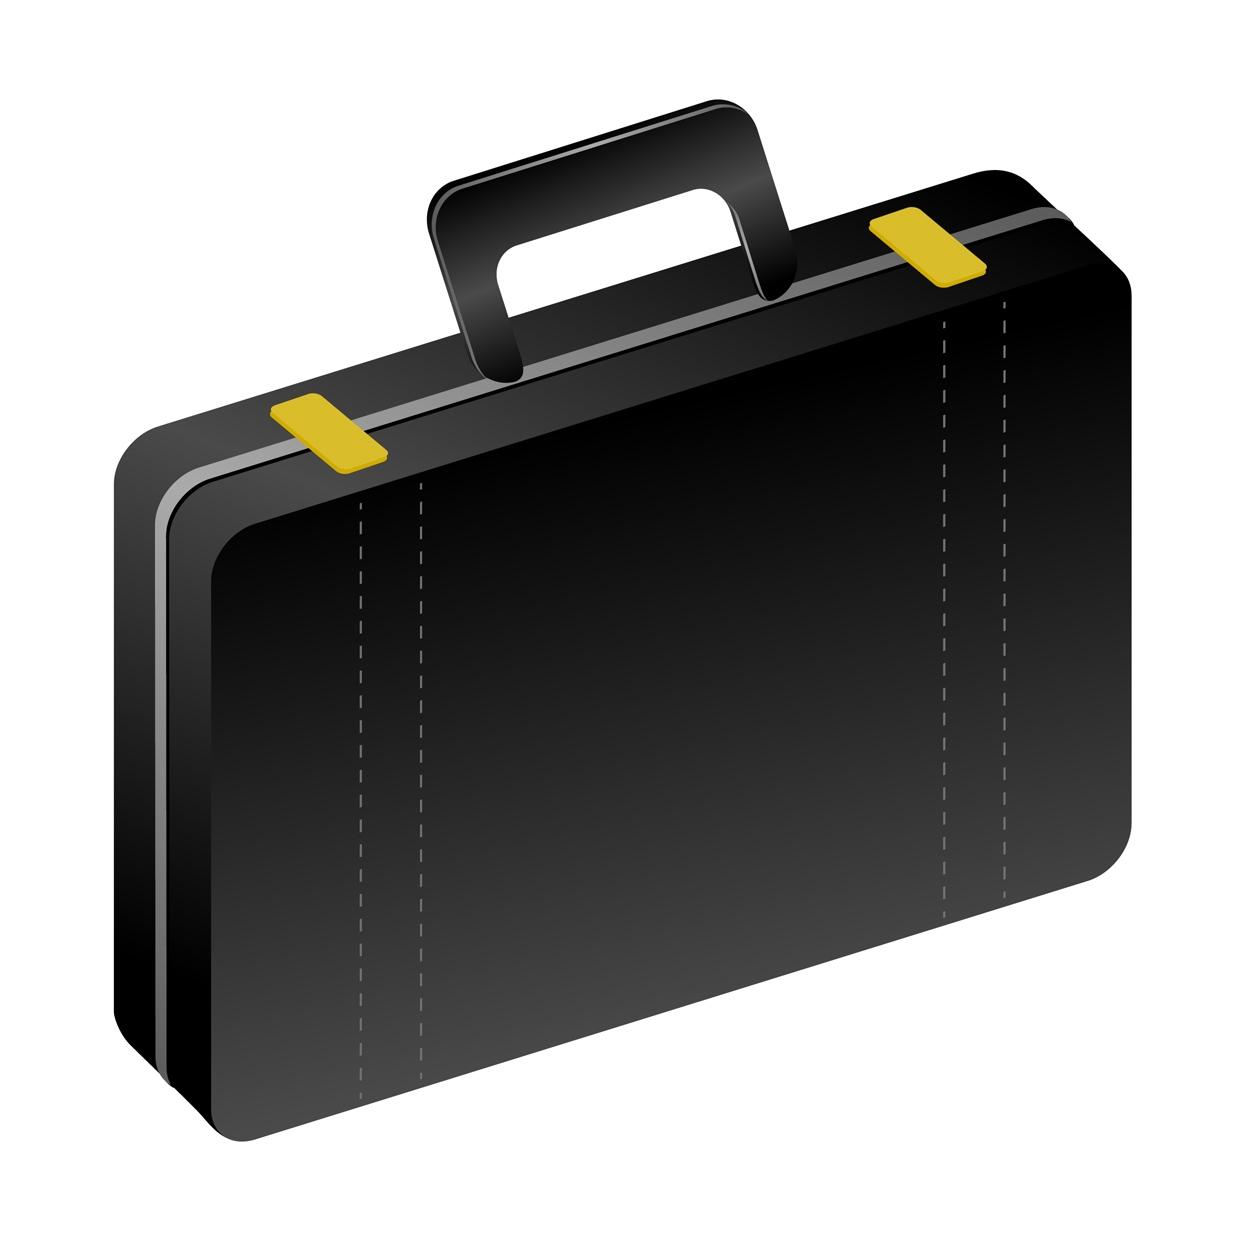 Business clipart suitcase Money clipart Zone Cliparts Business